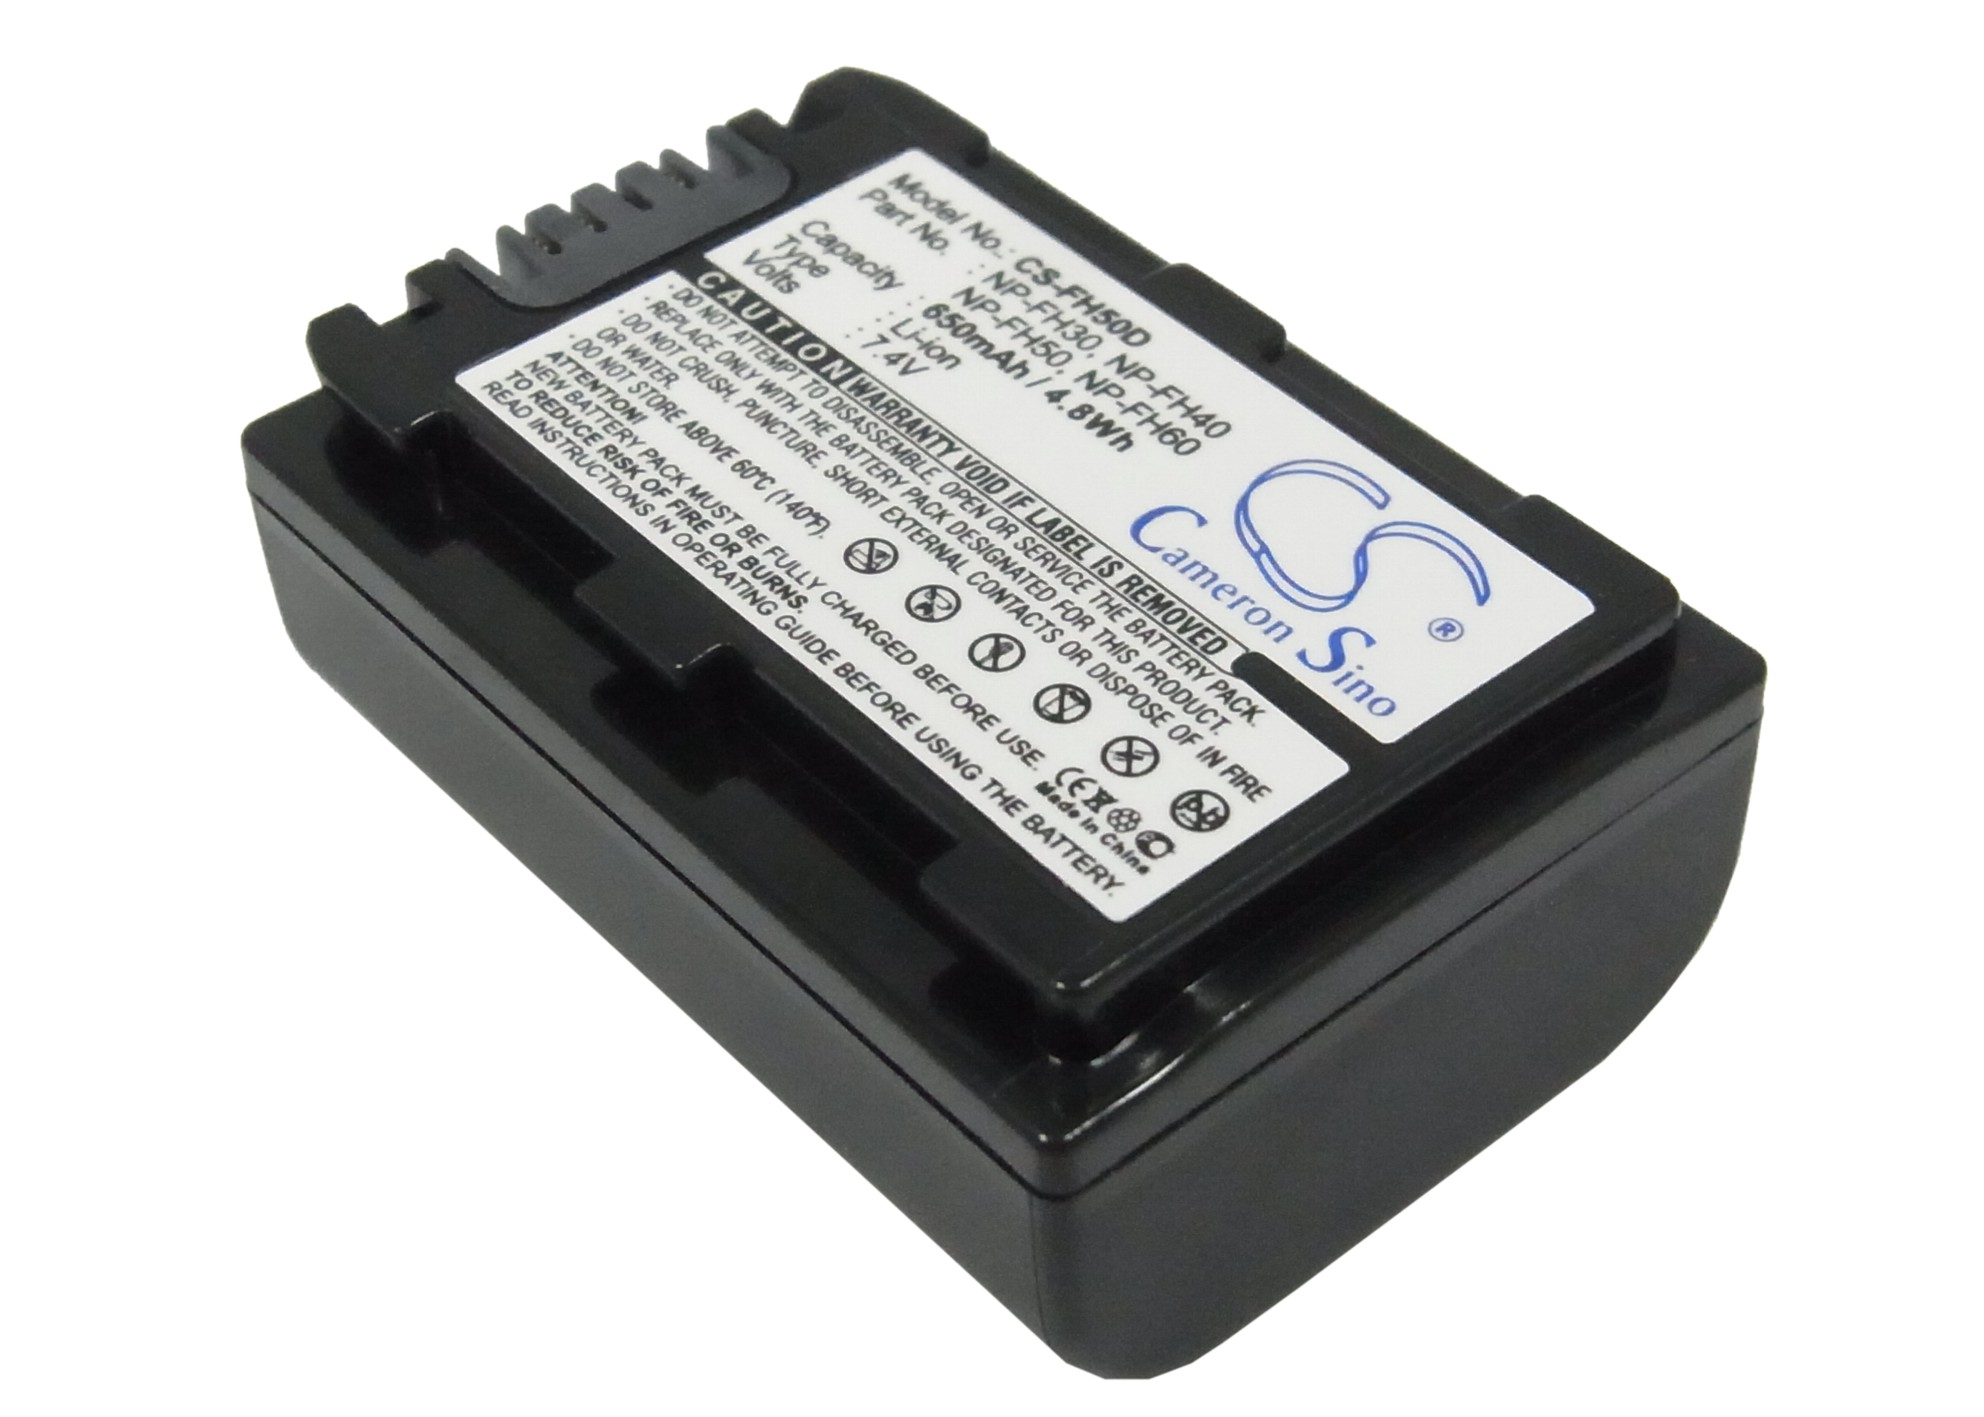 Cameron Sino baterie do kamer a fotoaparátů pro SONY DCR-SR90E 7.4V Li-ion 650mAh tmavě šedá - neoriginální